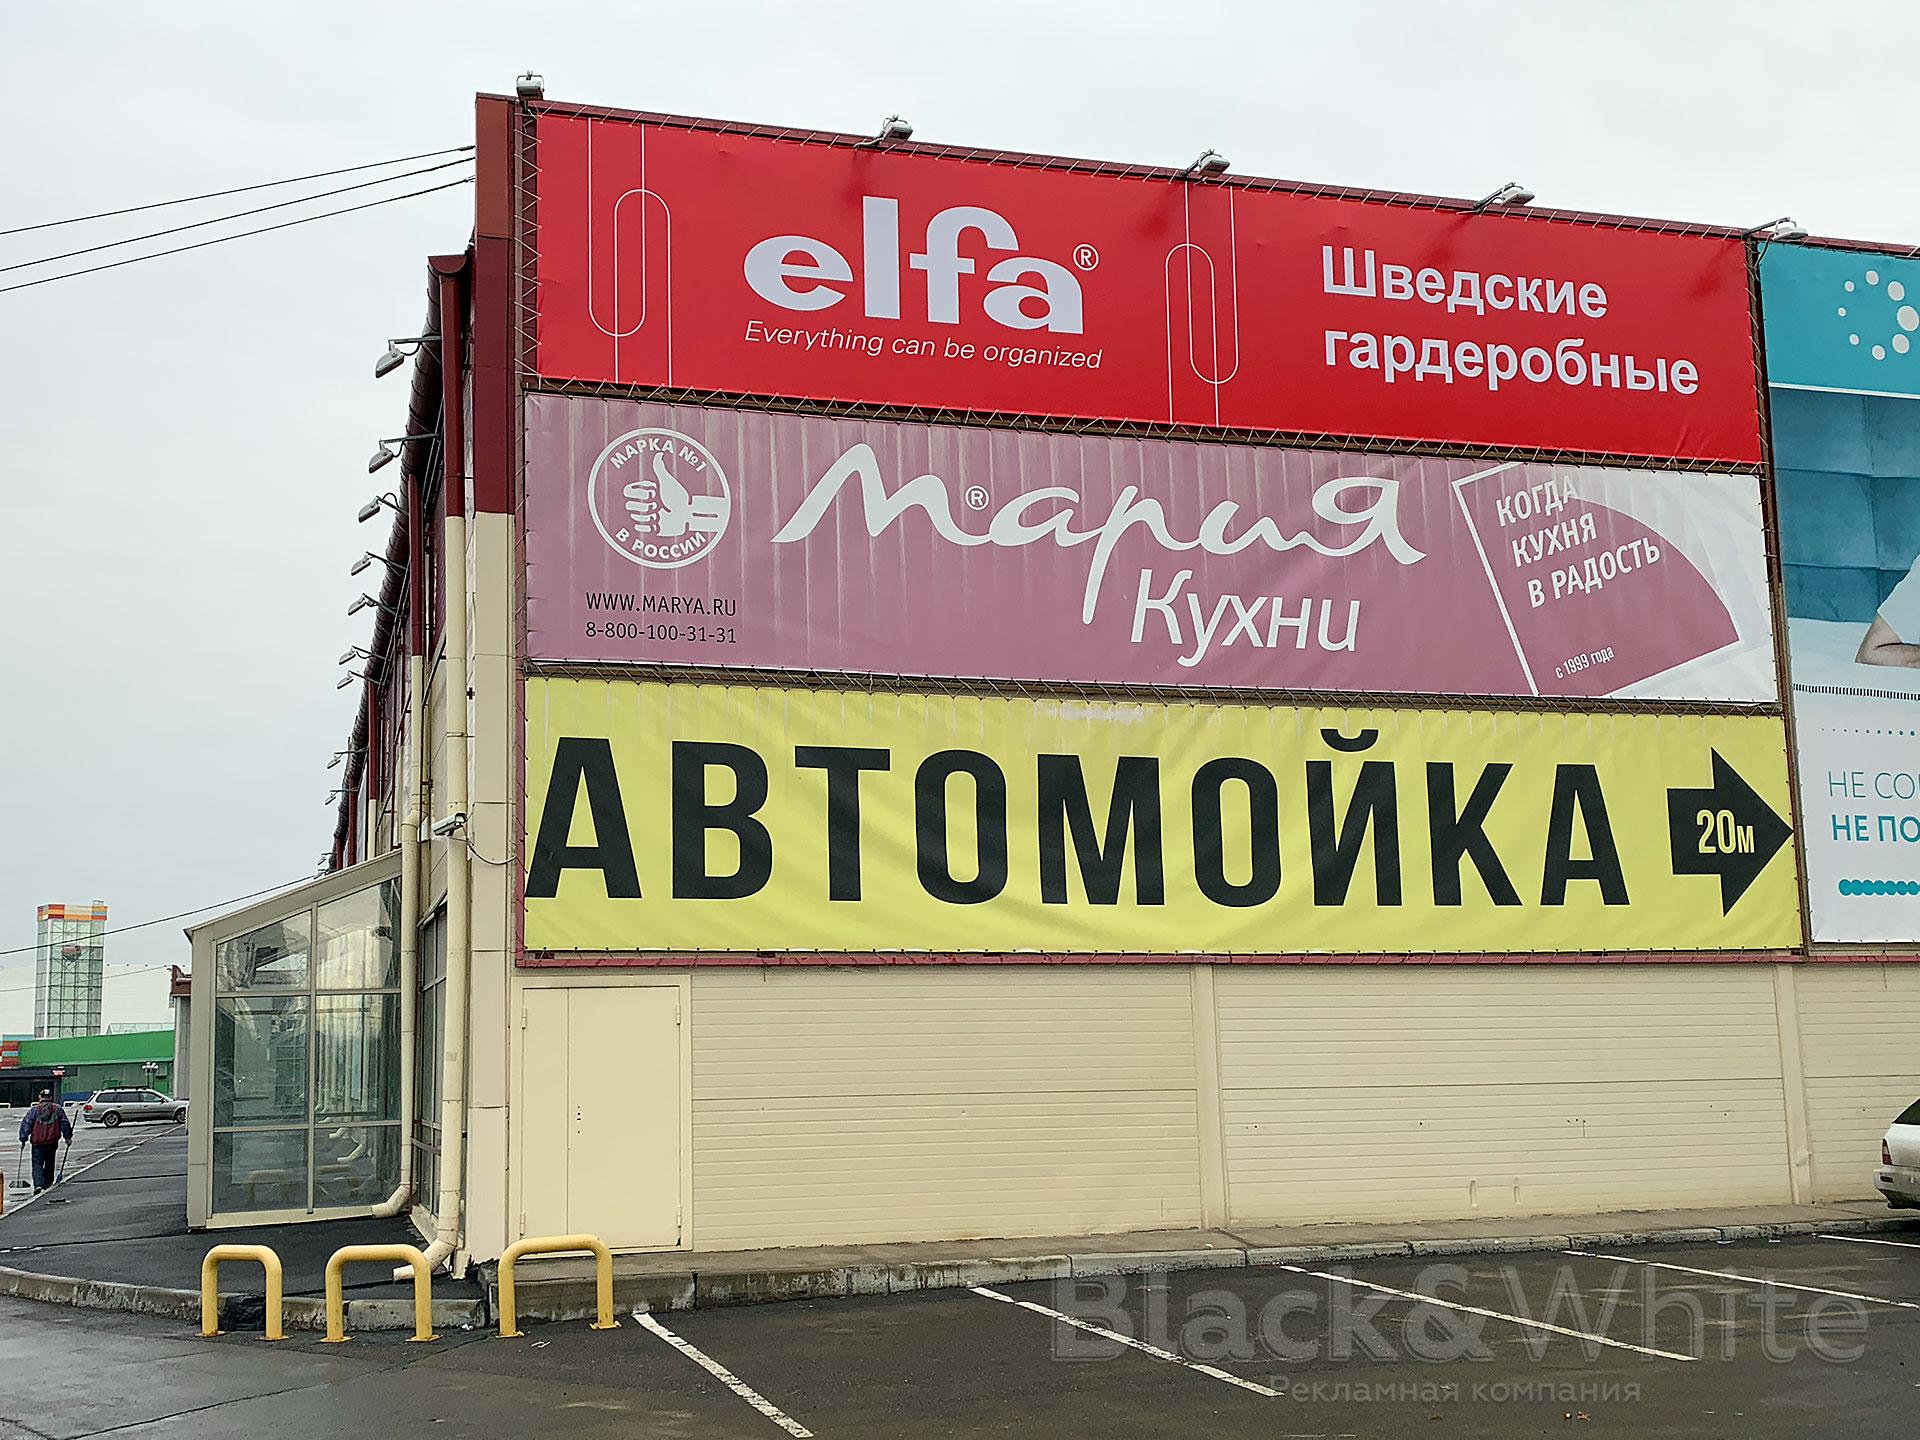 Печать-на-баннере-в-Красноярске-BW.jpg